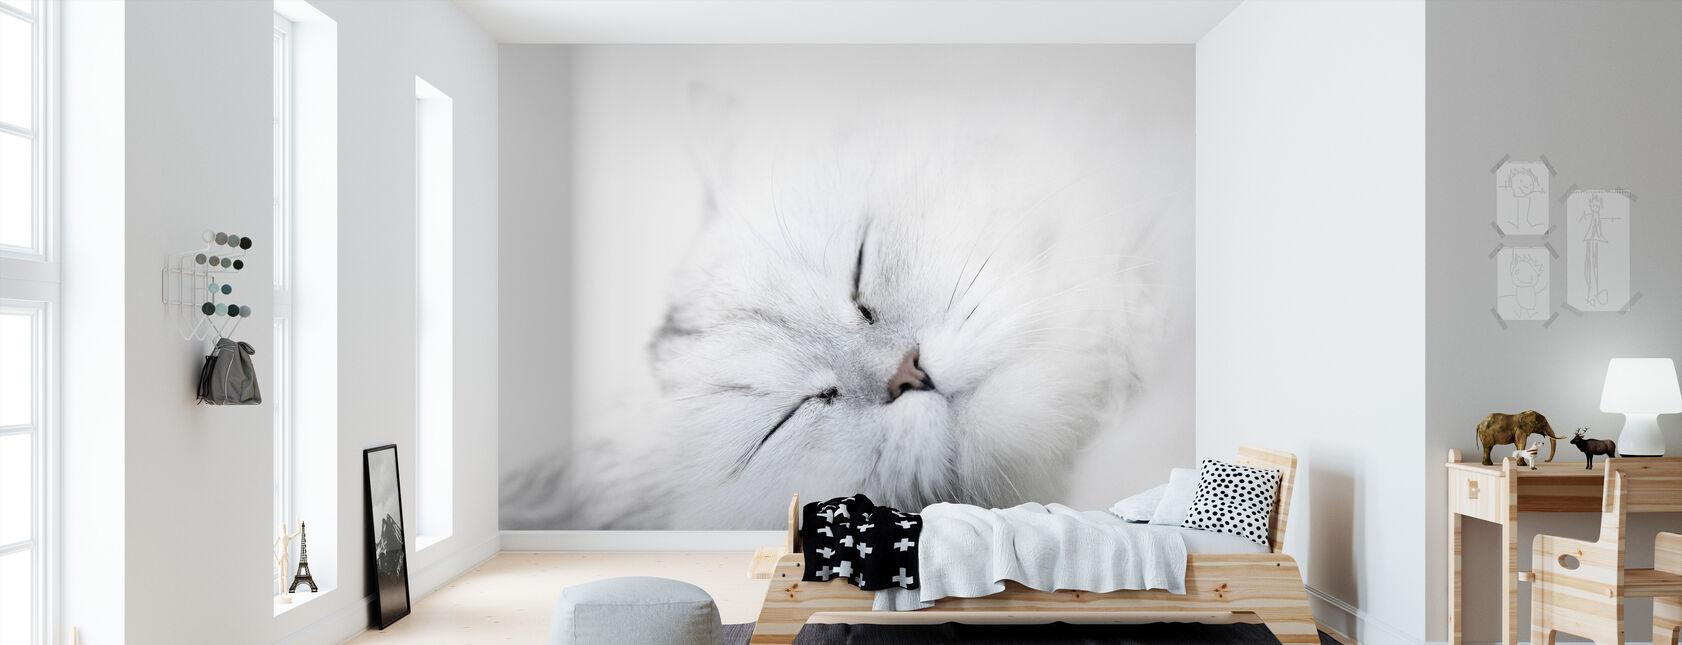 Witte Kat - Behang - Kinderkamer